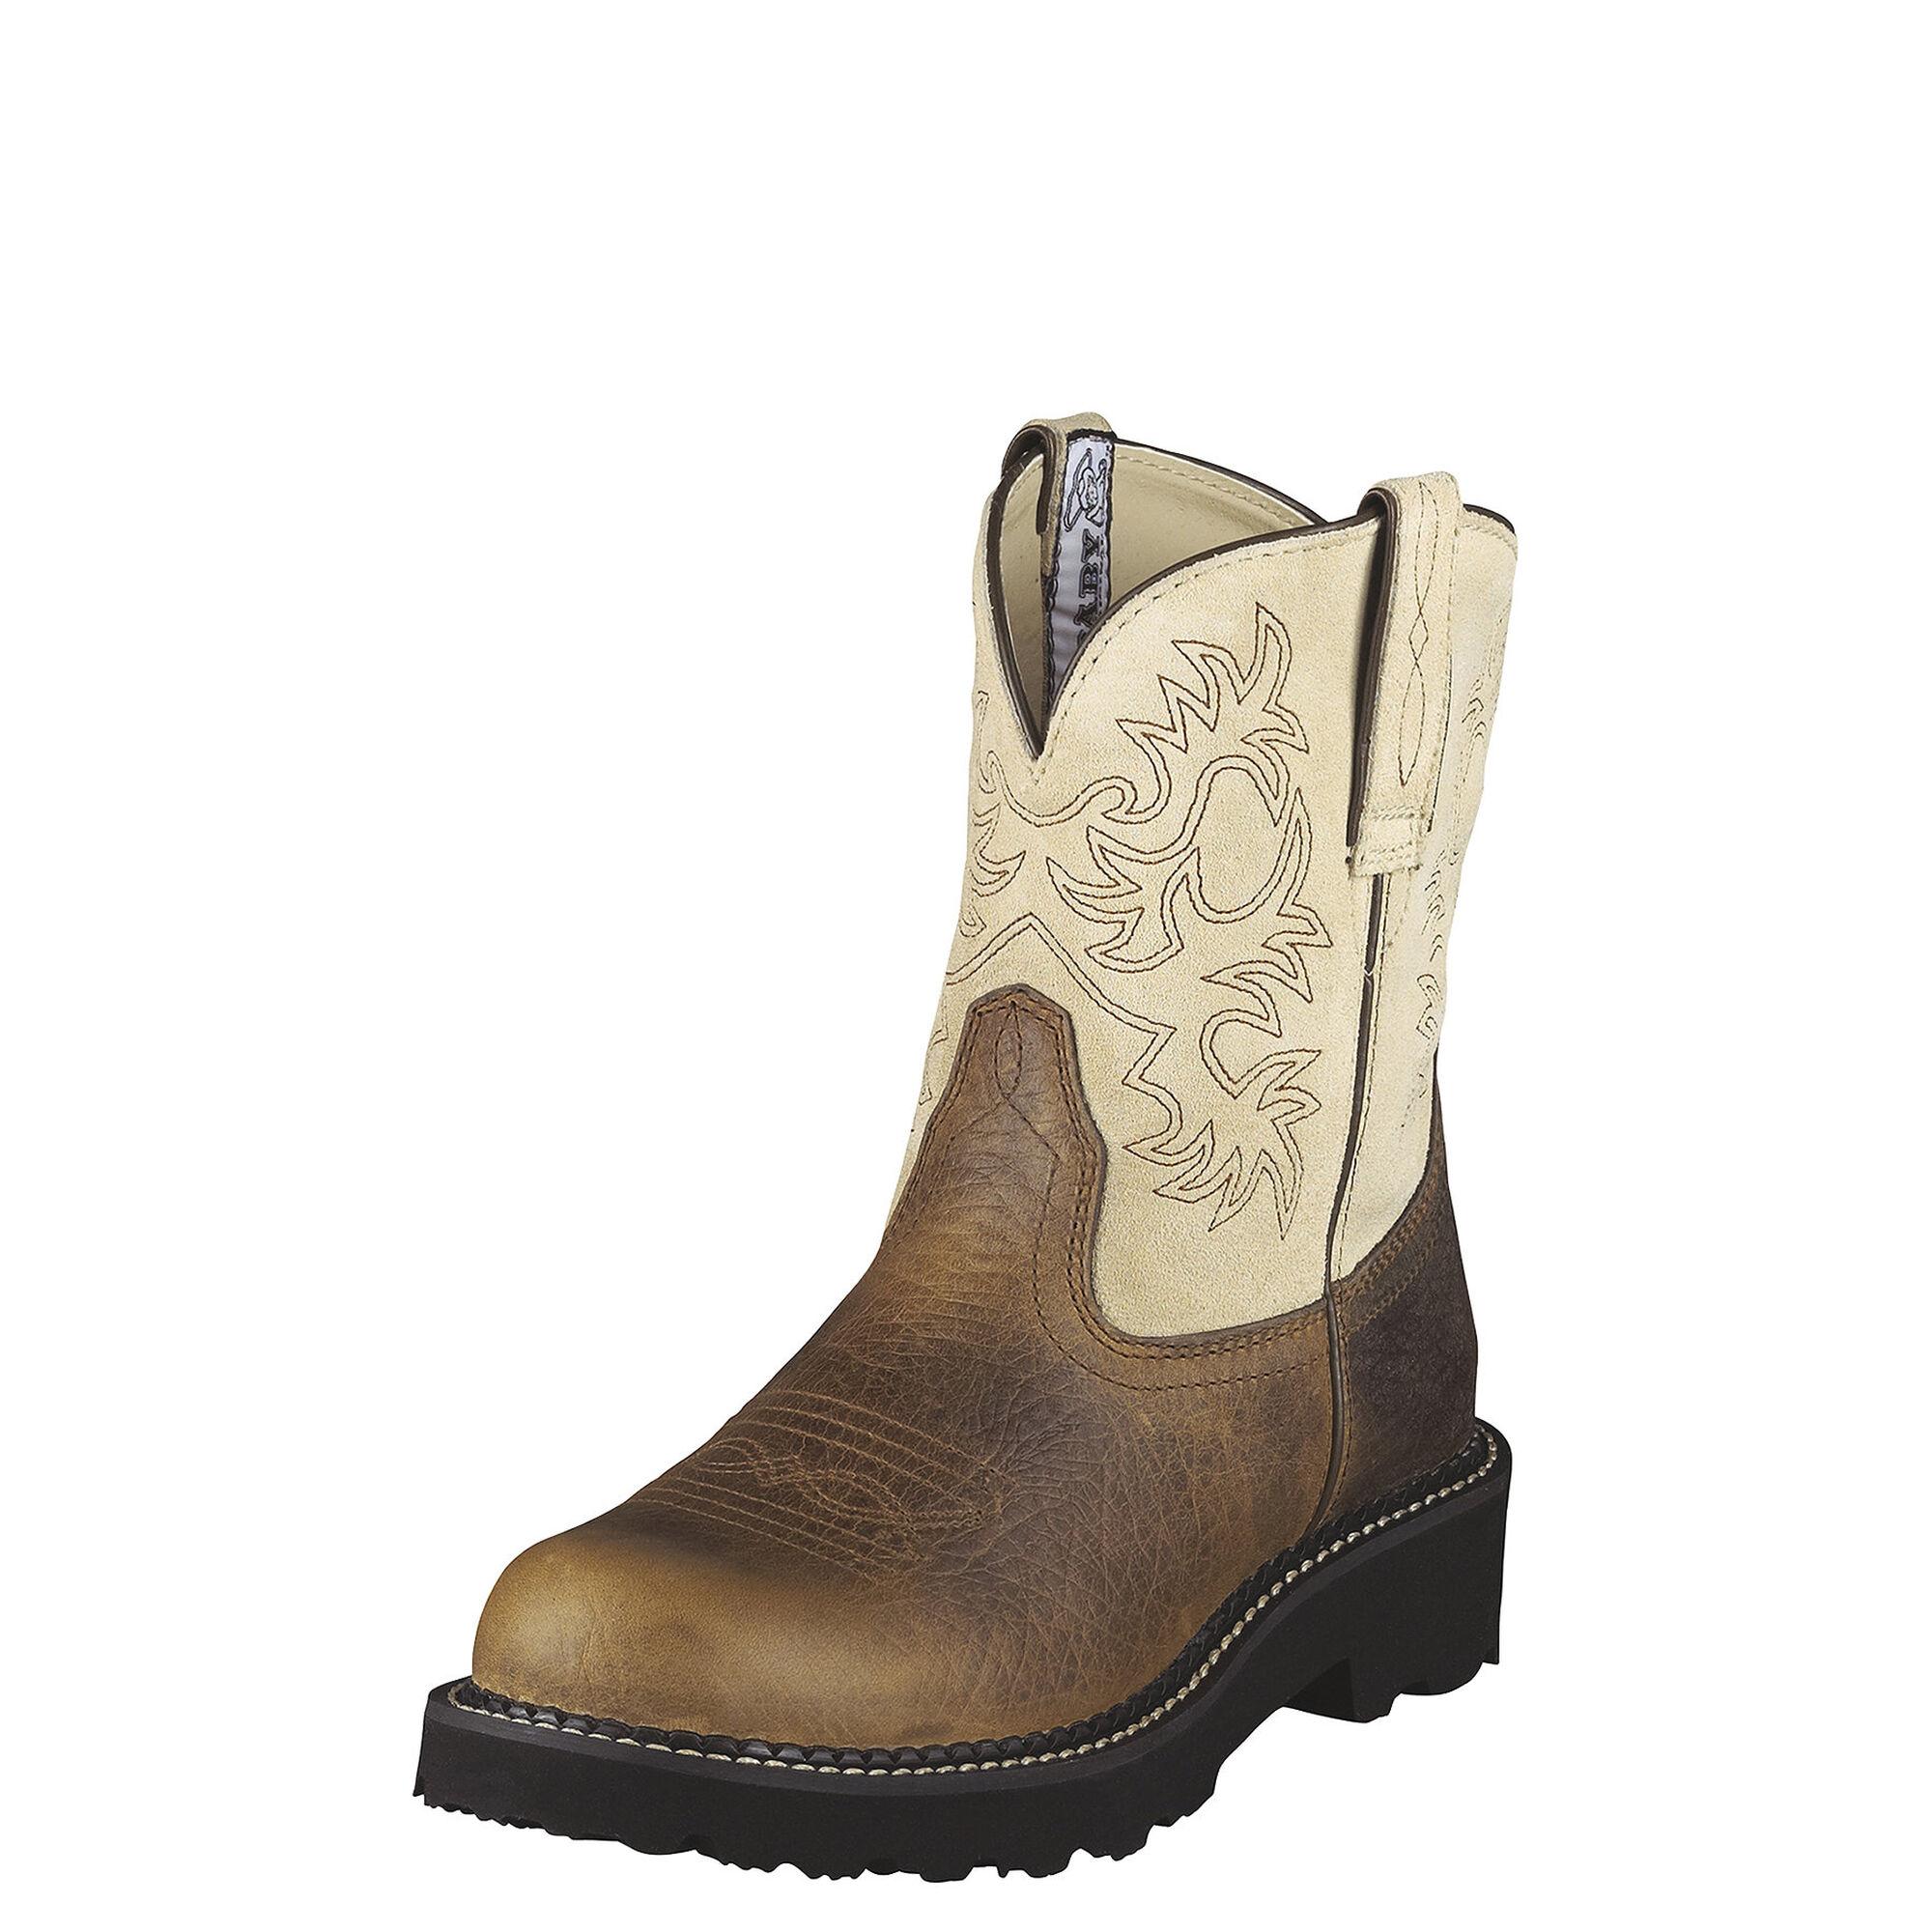 5b515ed344d Fatbaby Western Boot